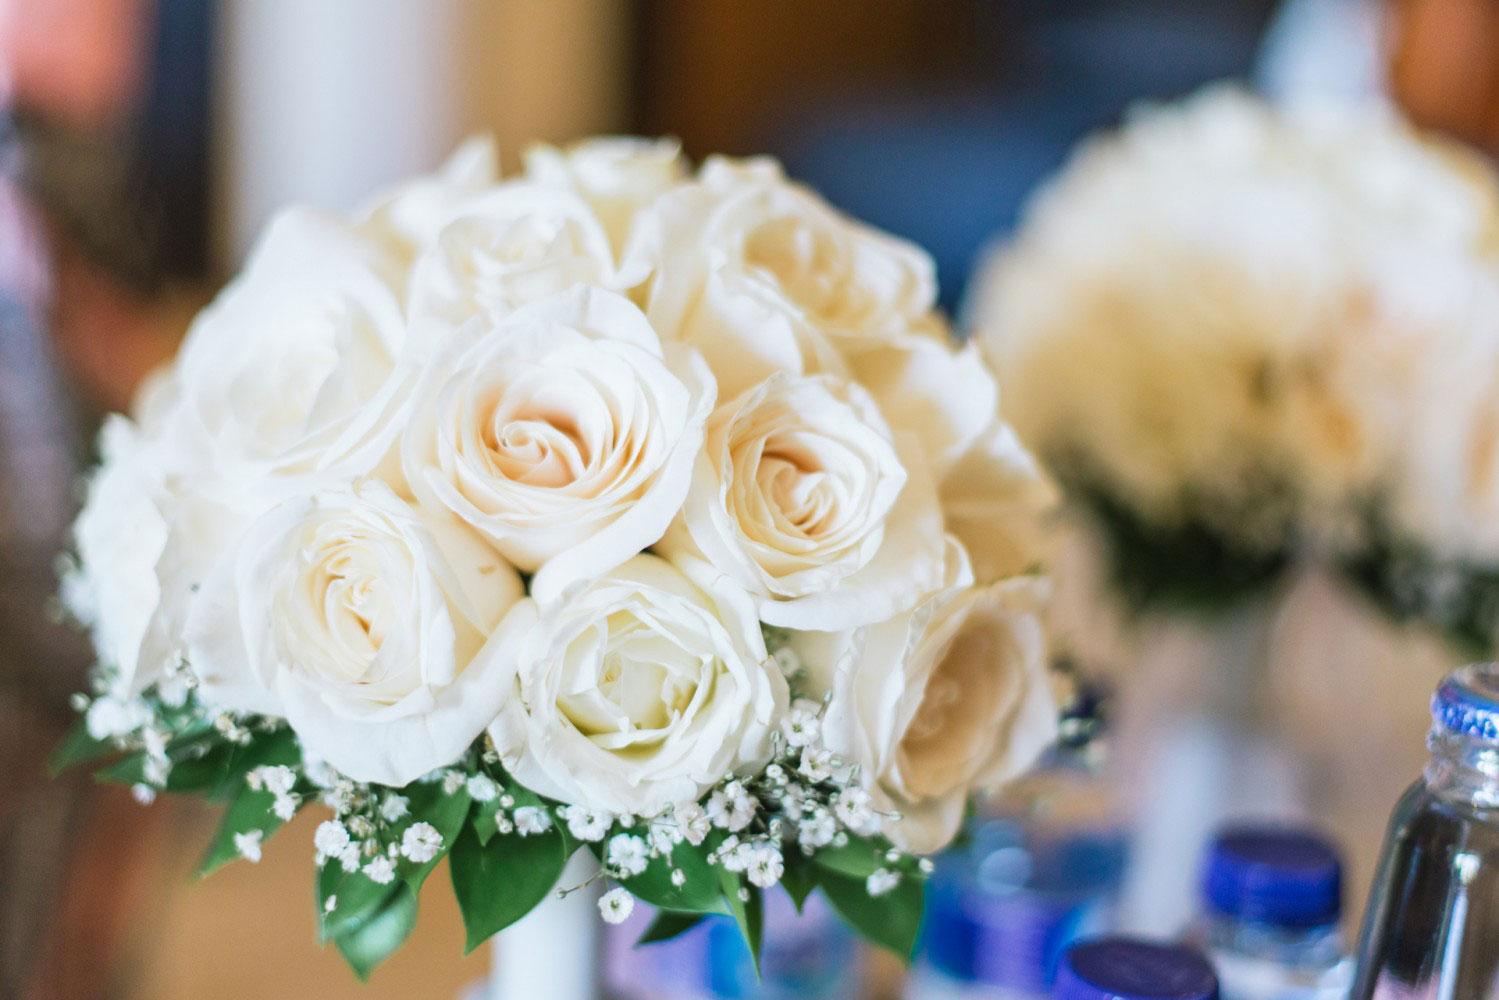 Jessica-Lemon-Photography-Adelaide-Wedding-Photographer-Bouquet.jpg